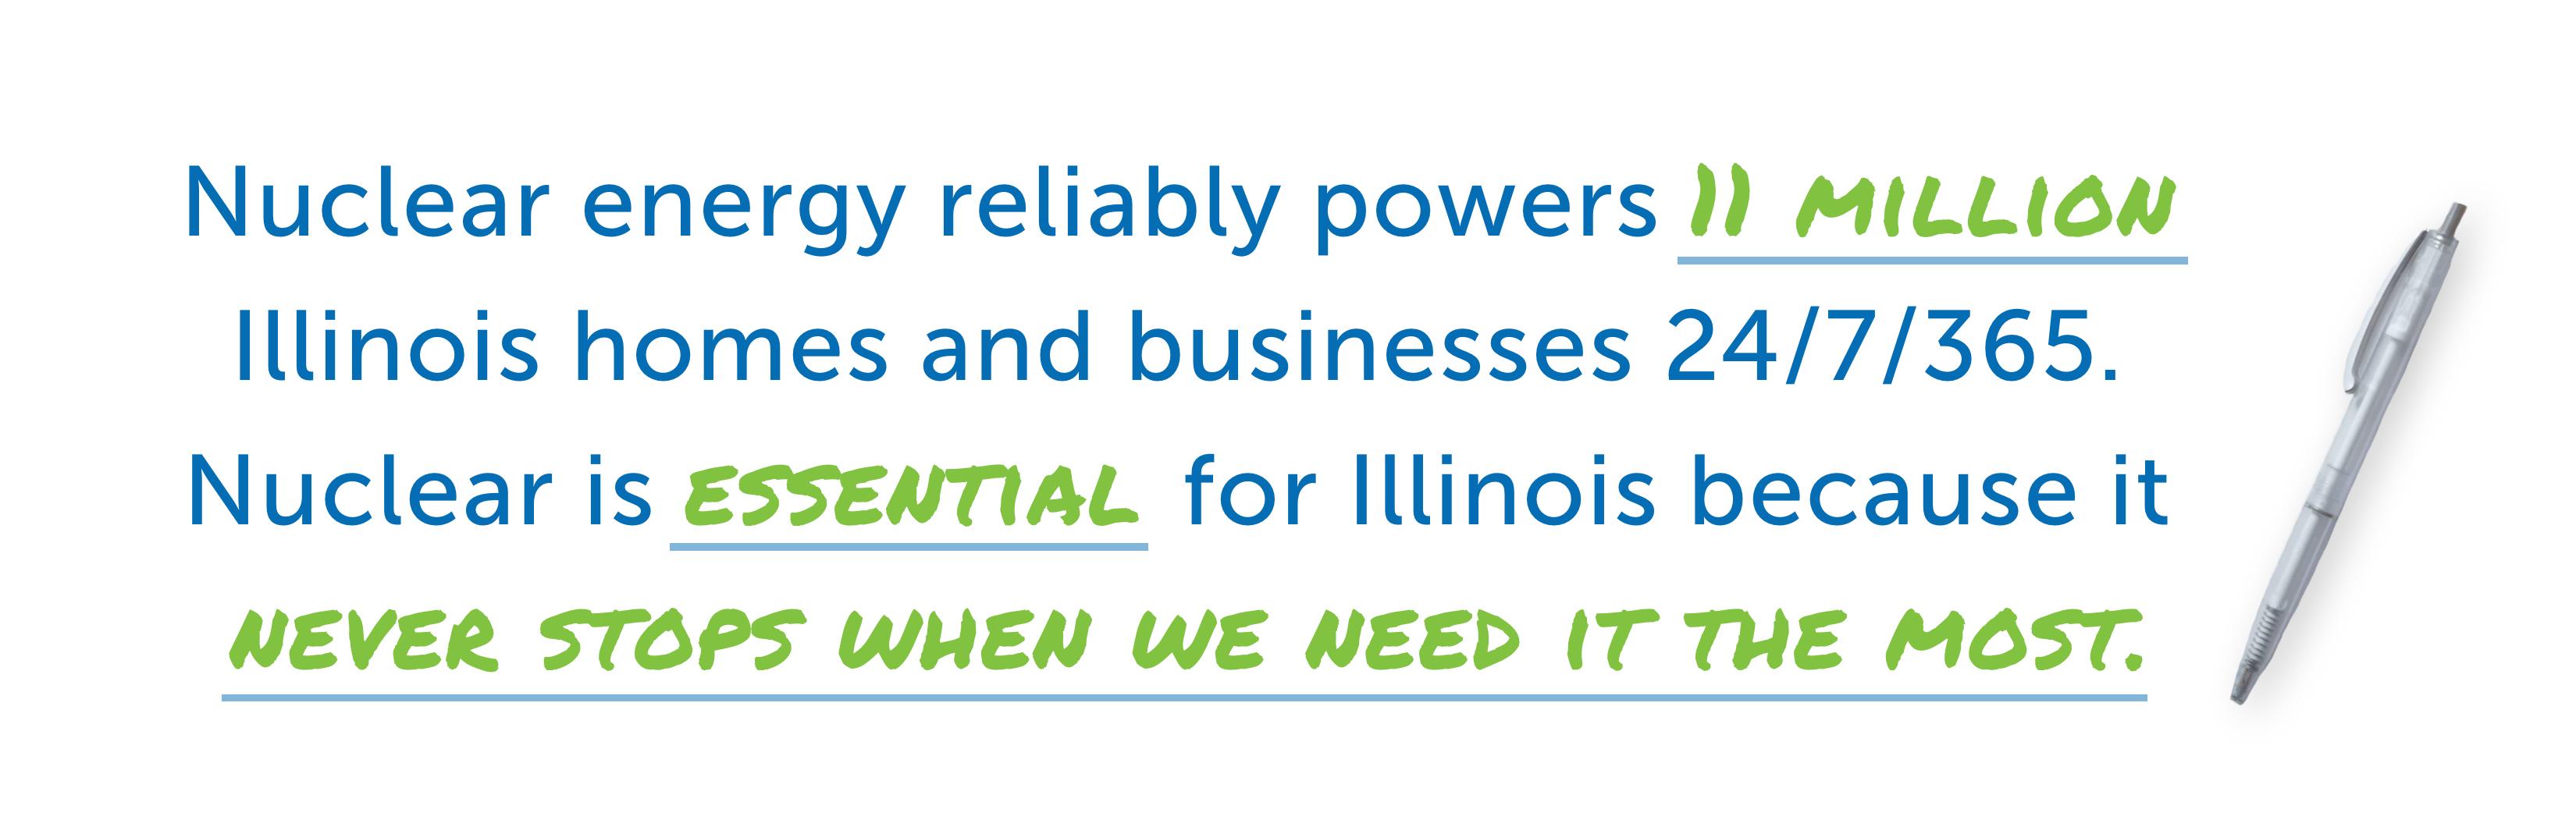 Nuclear energy reliably powers Illinois